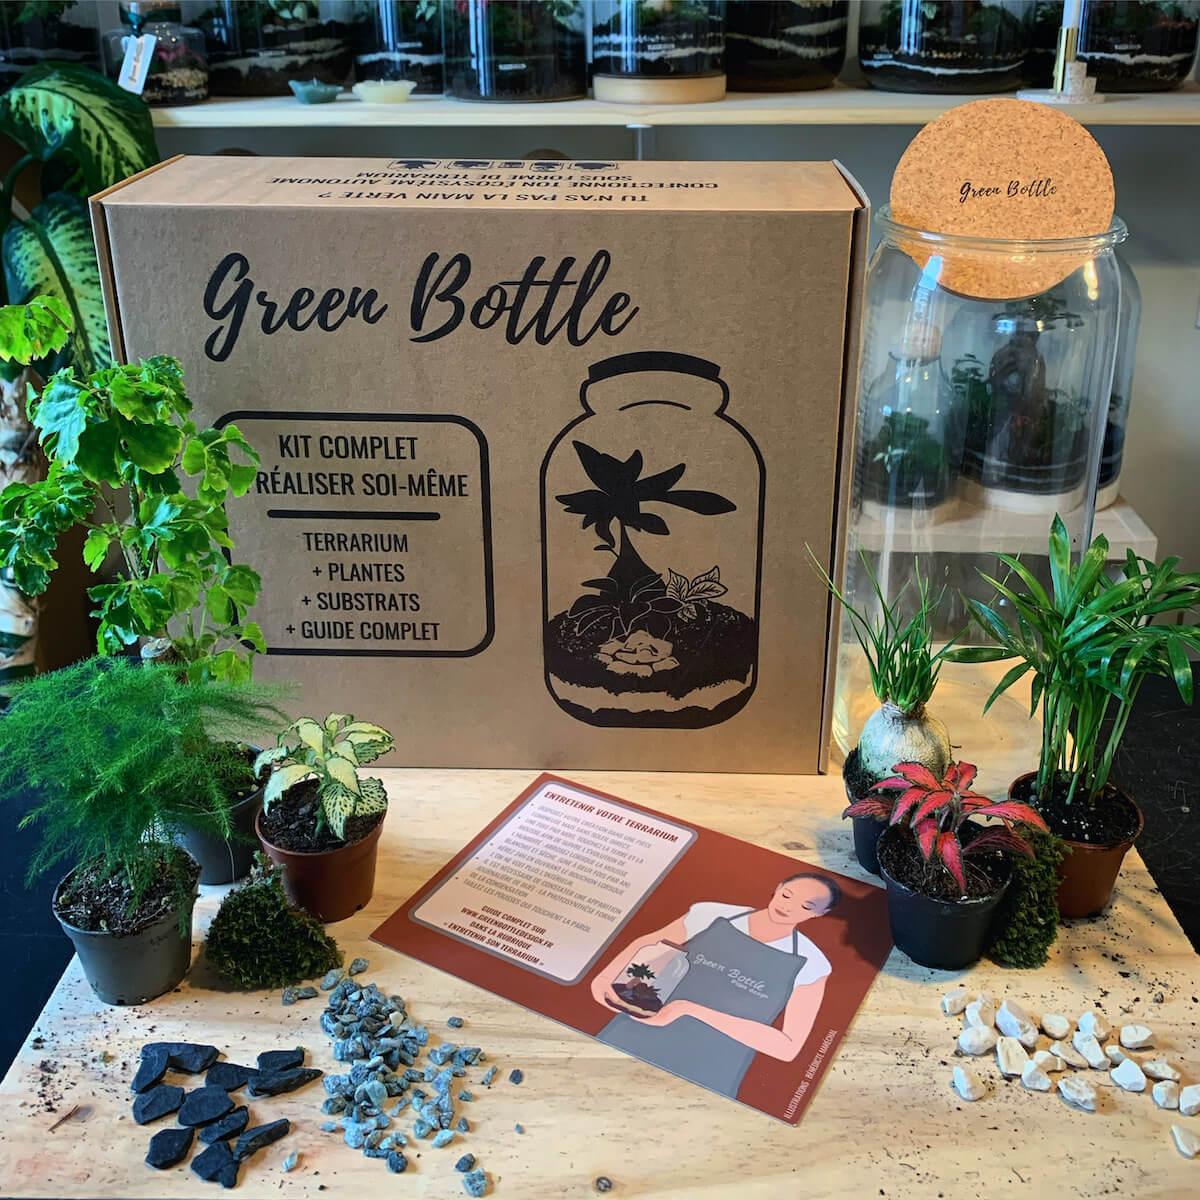 Produits et packaging Green Bottle Design